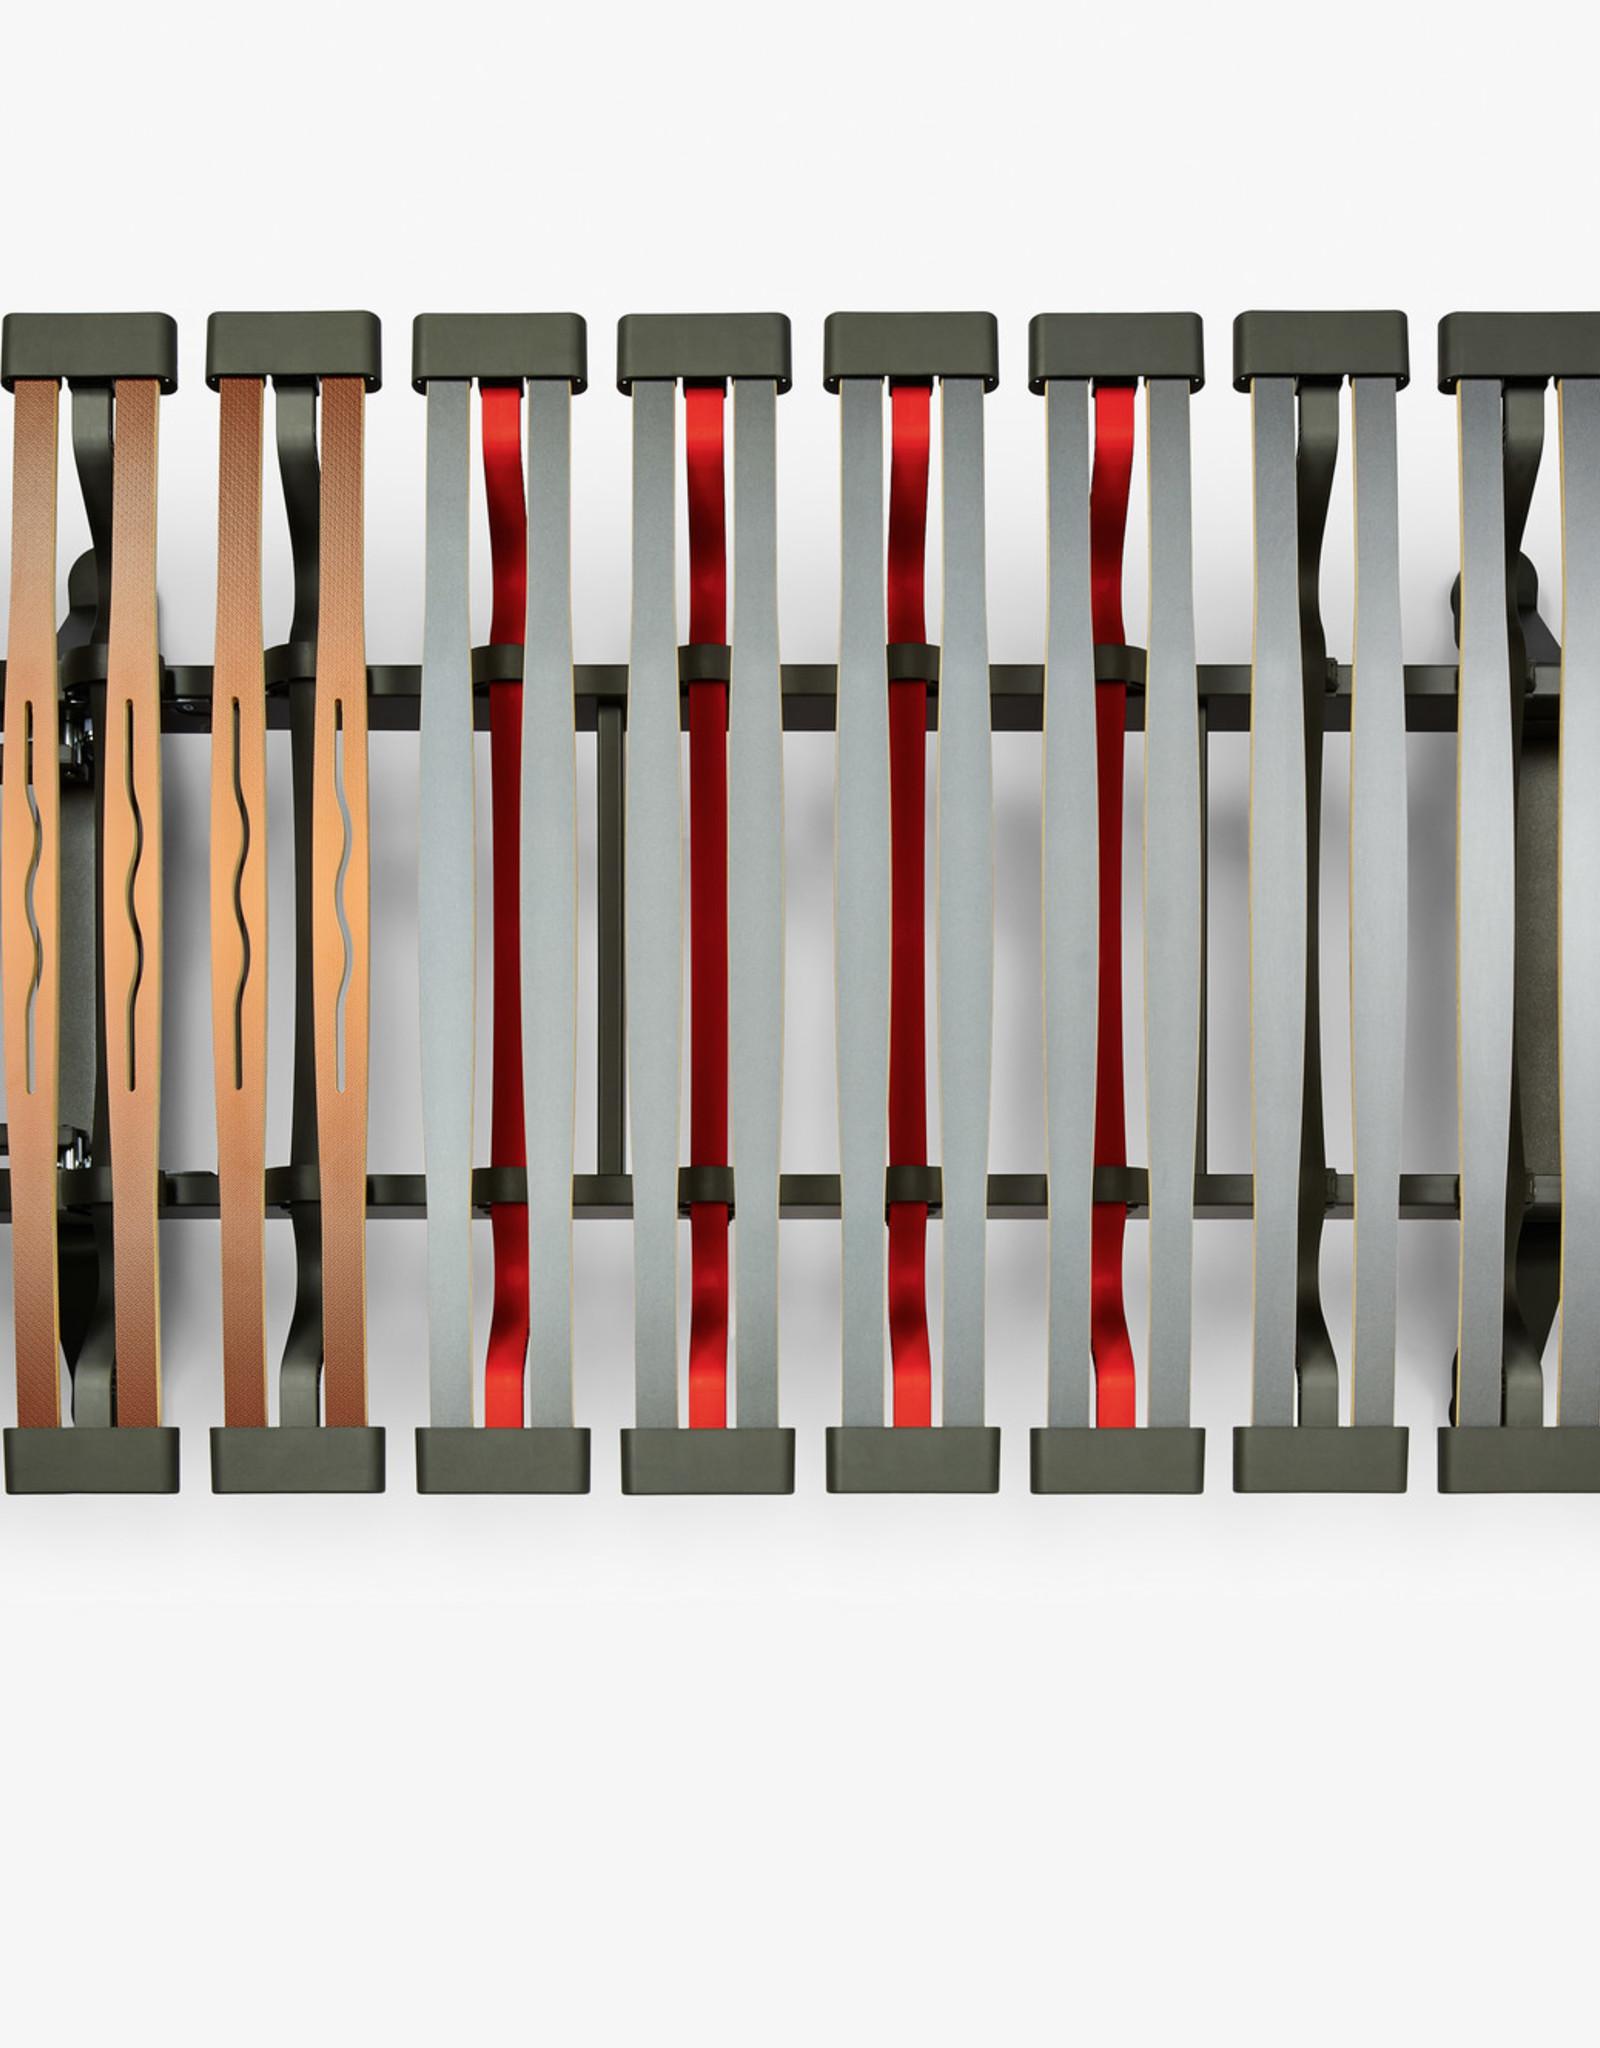 Swissflex Lattenbodem Uni 20-45 pneumatisch